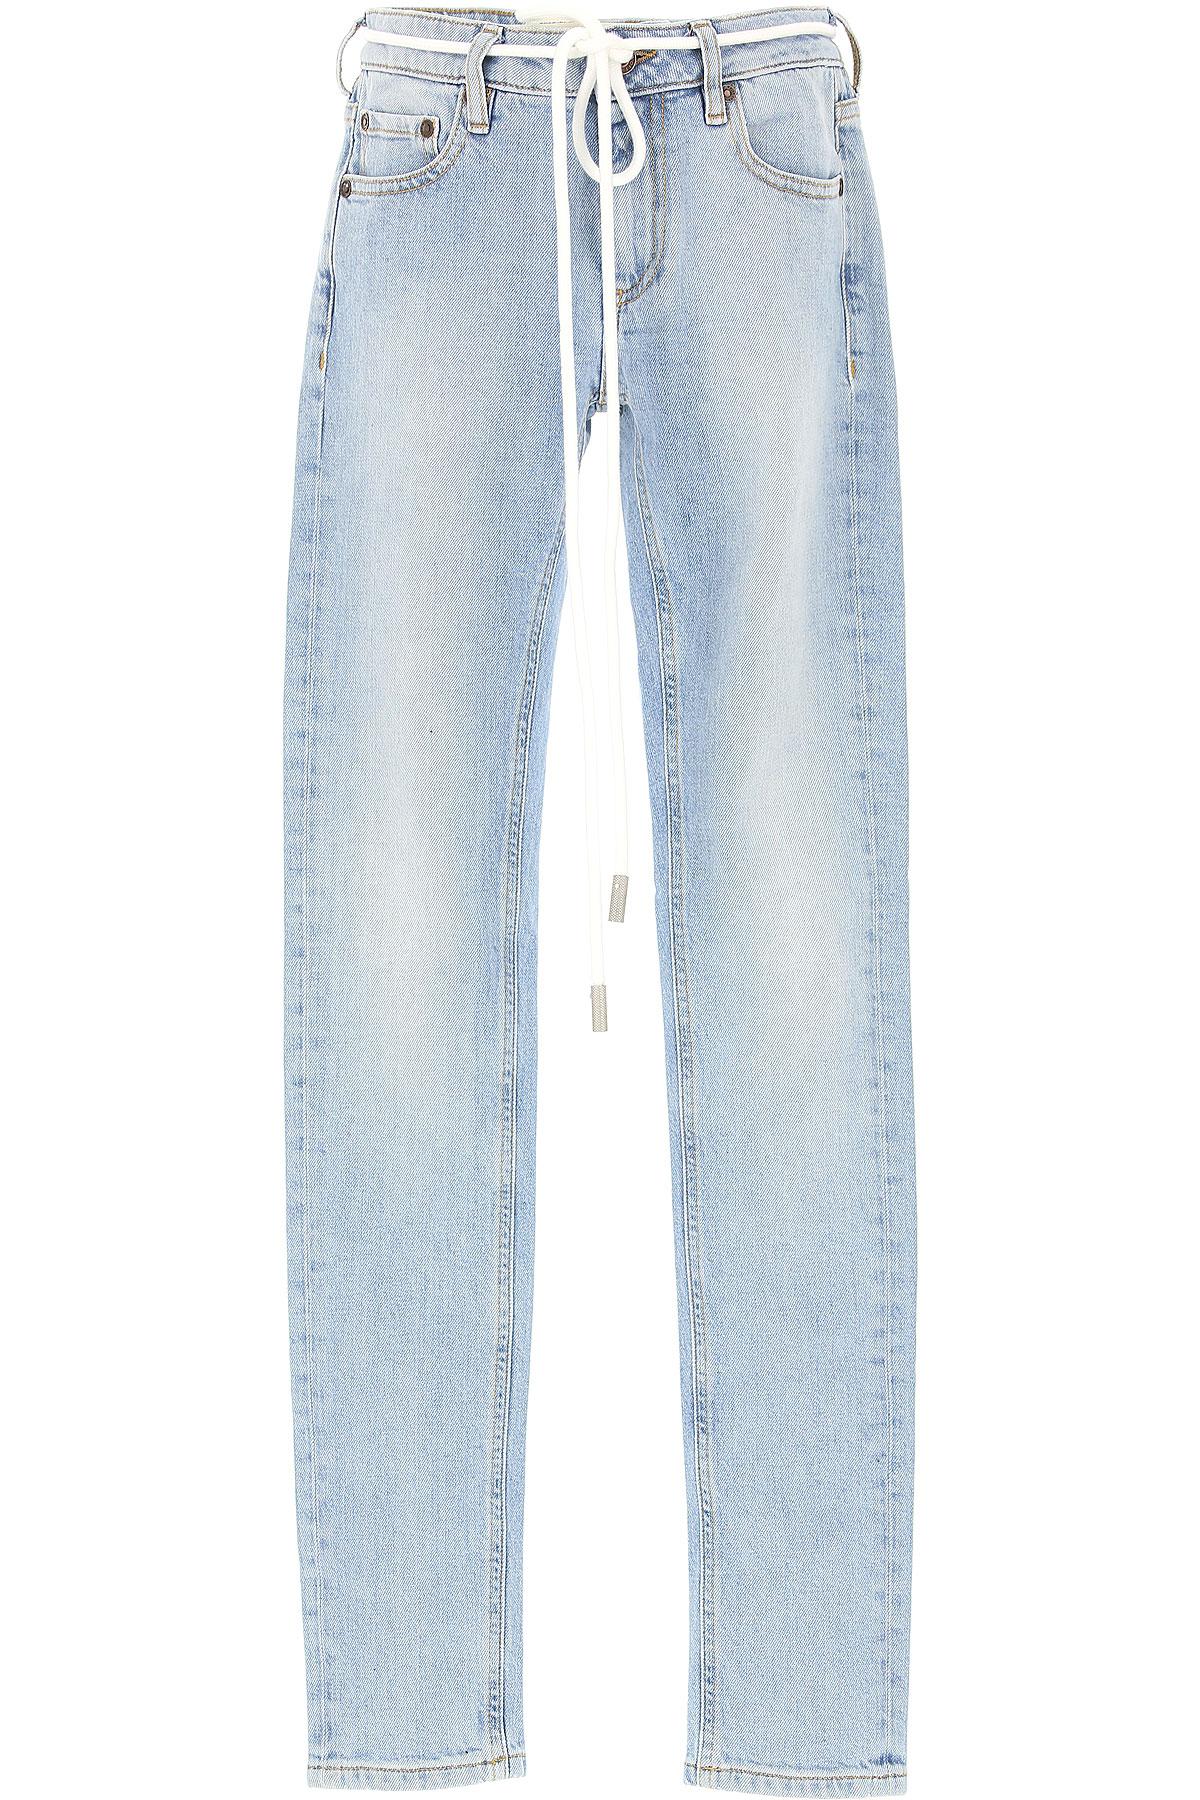 Off-White Virgil Abloh Jeans On Sale, Light Blue, polyester, 2017, 25 27 USA-465886